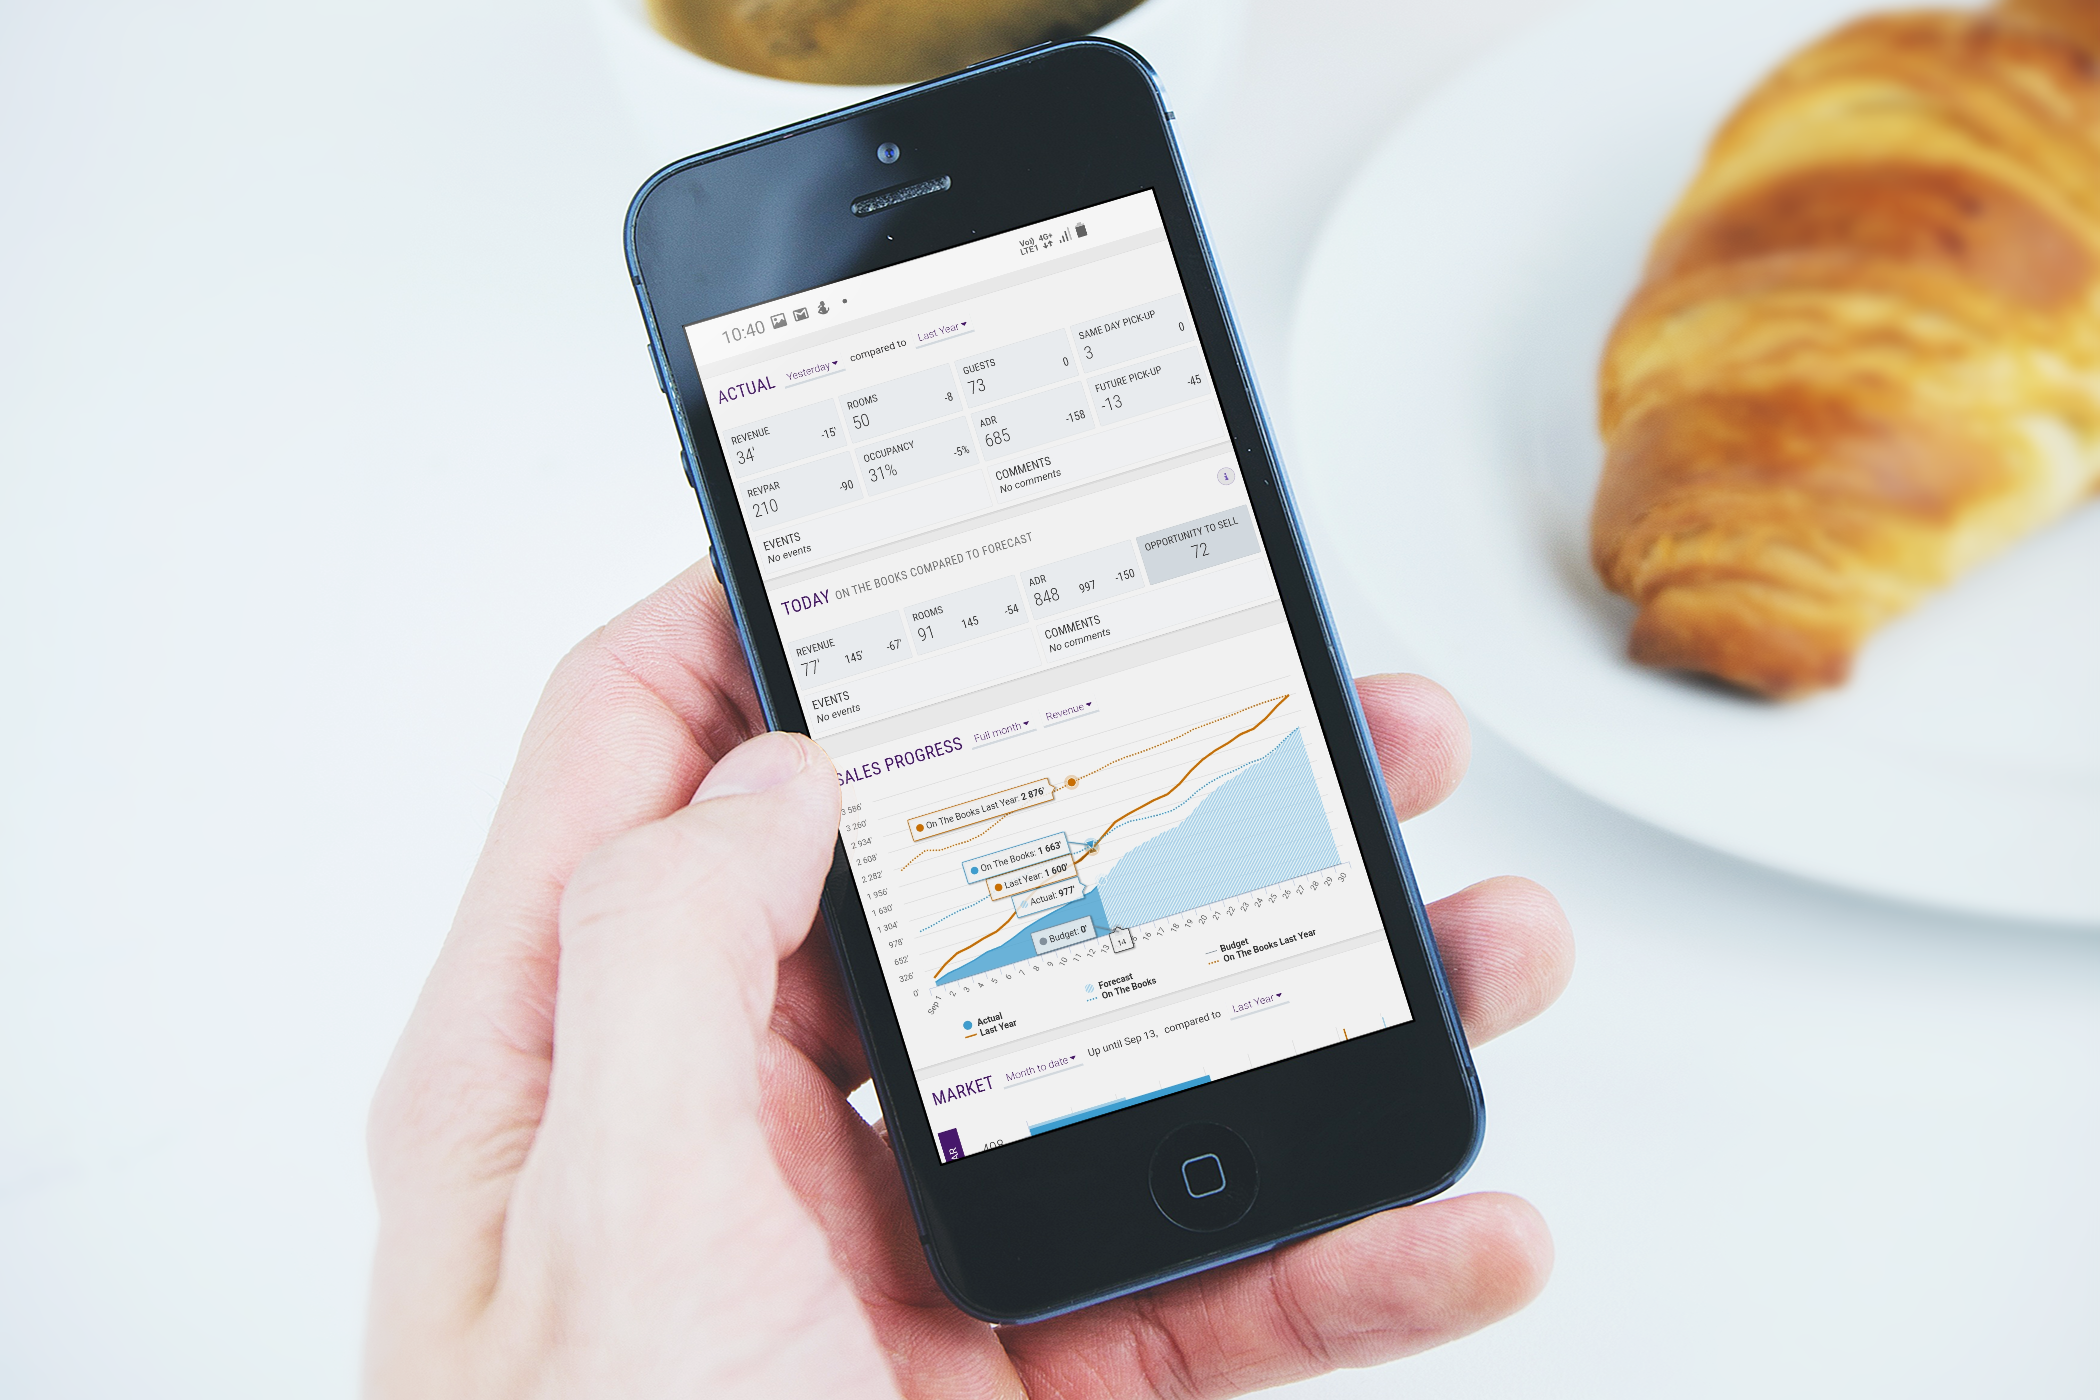 iPhone on breakfast - Dashboard